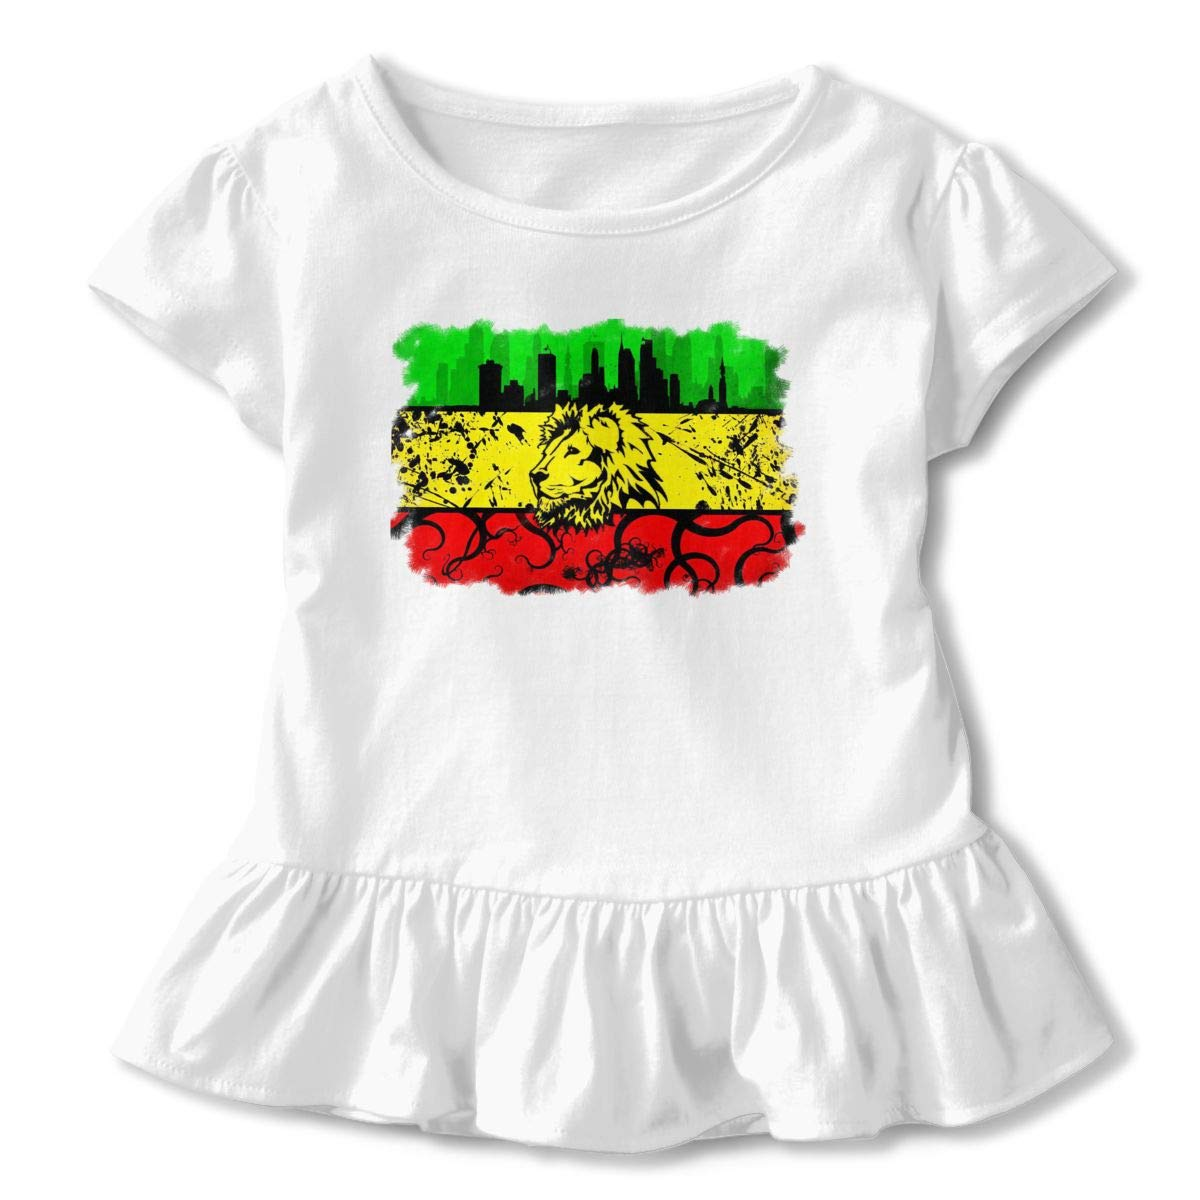 Cheng Jian Bo Lion of Jamaica Reggae Toddler Girls T Shirt Kids Cotton Short Sleeve Ruffle Tee